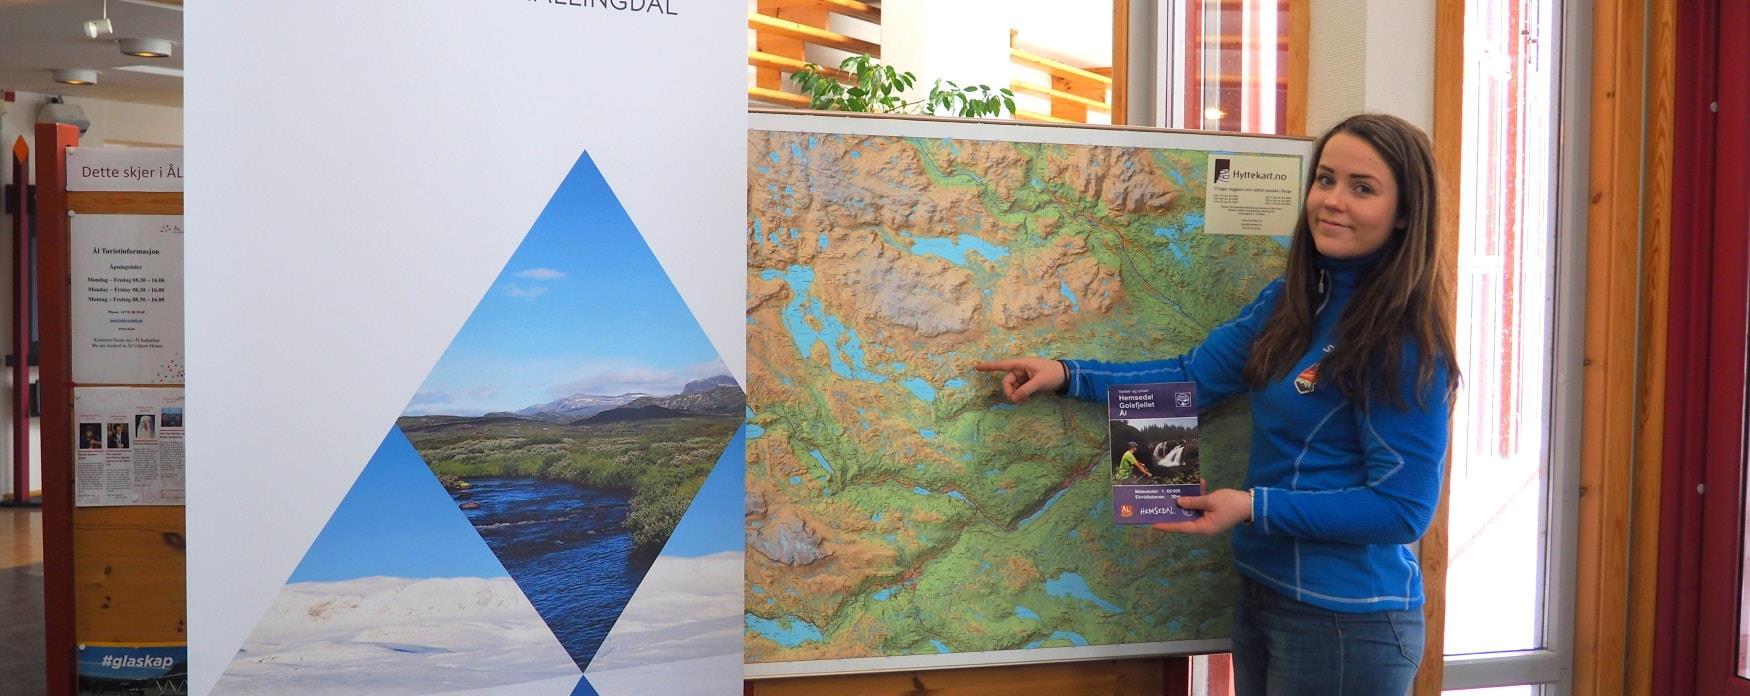 Information at Ål tourist information centre